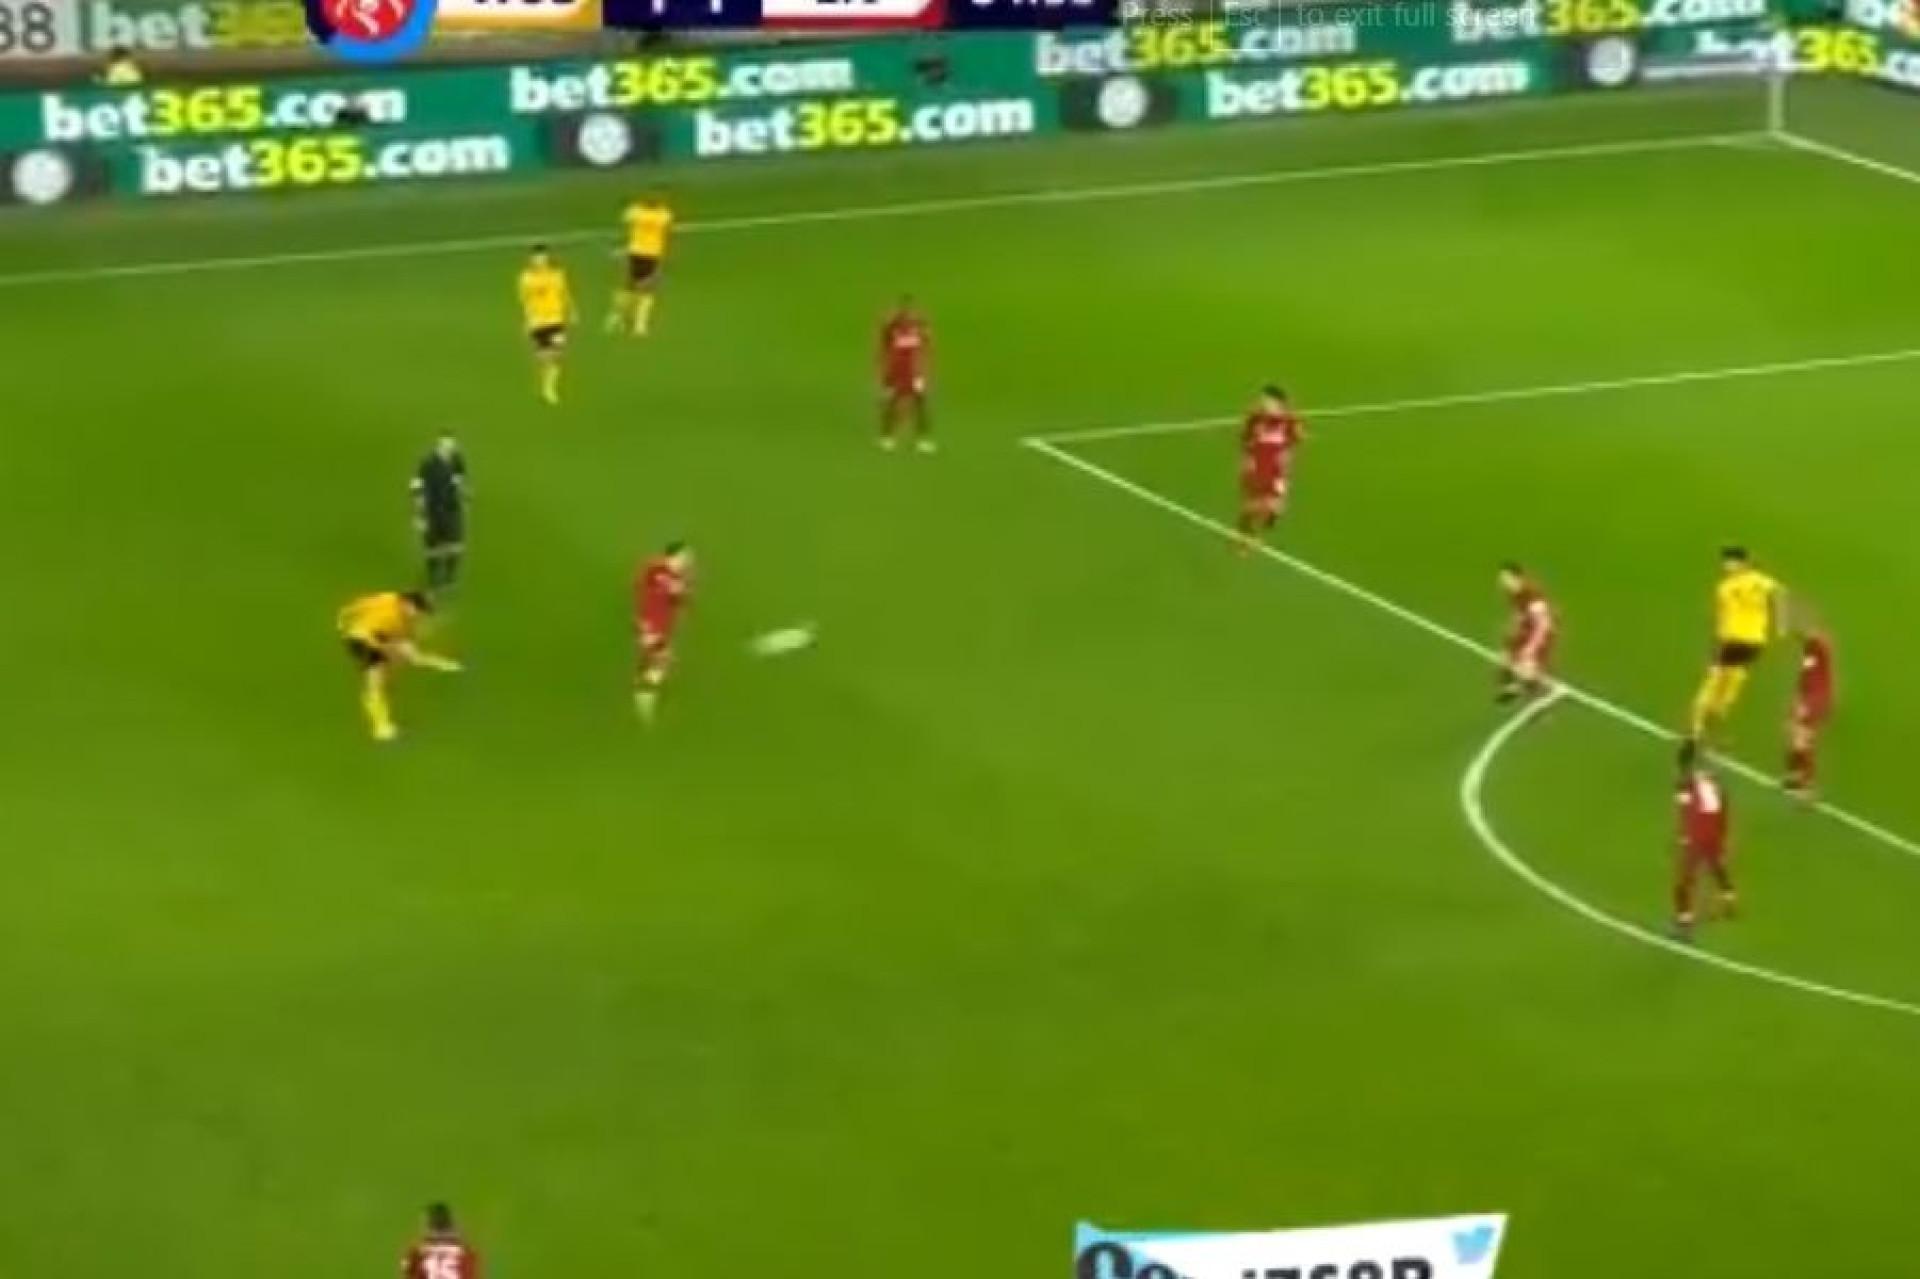 Remate do meio da rua e Rúben Neves marca ao Liverpool